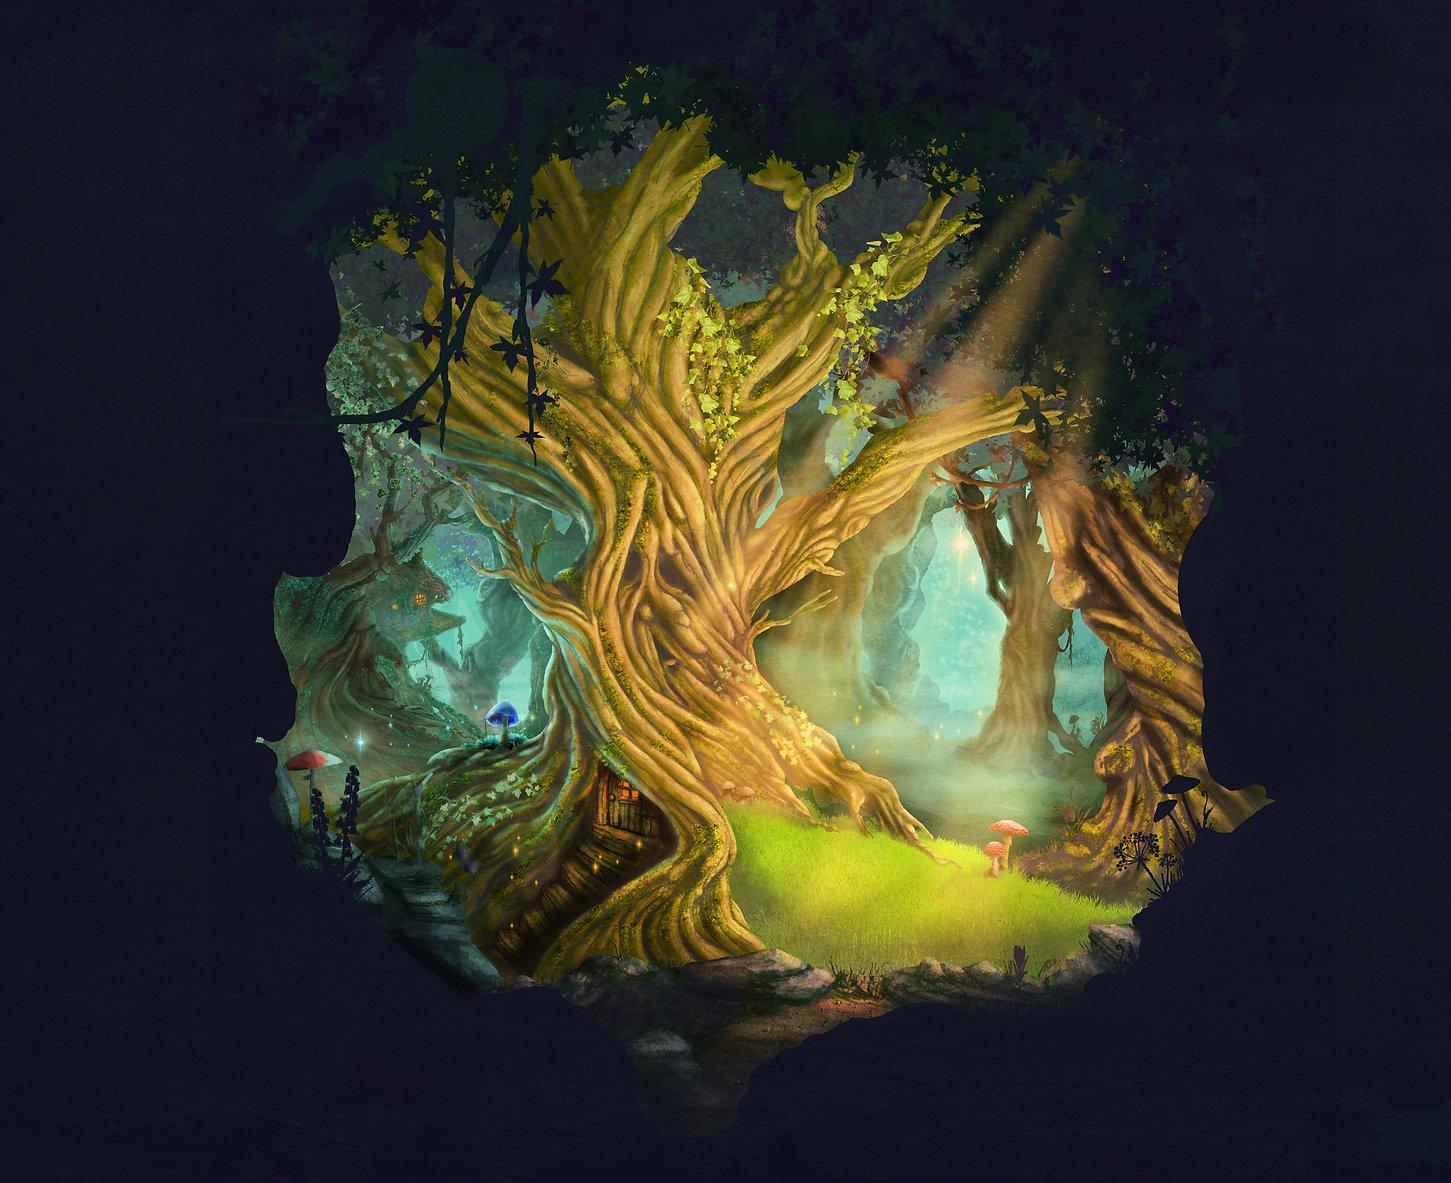 Enchanted_trees_1_edited.jpg